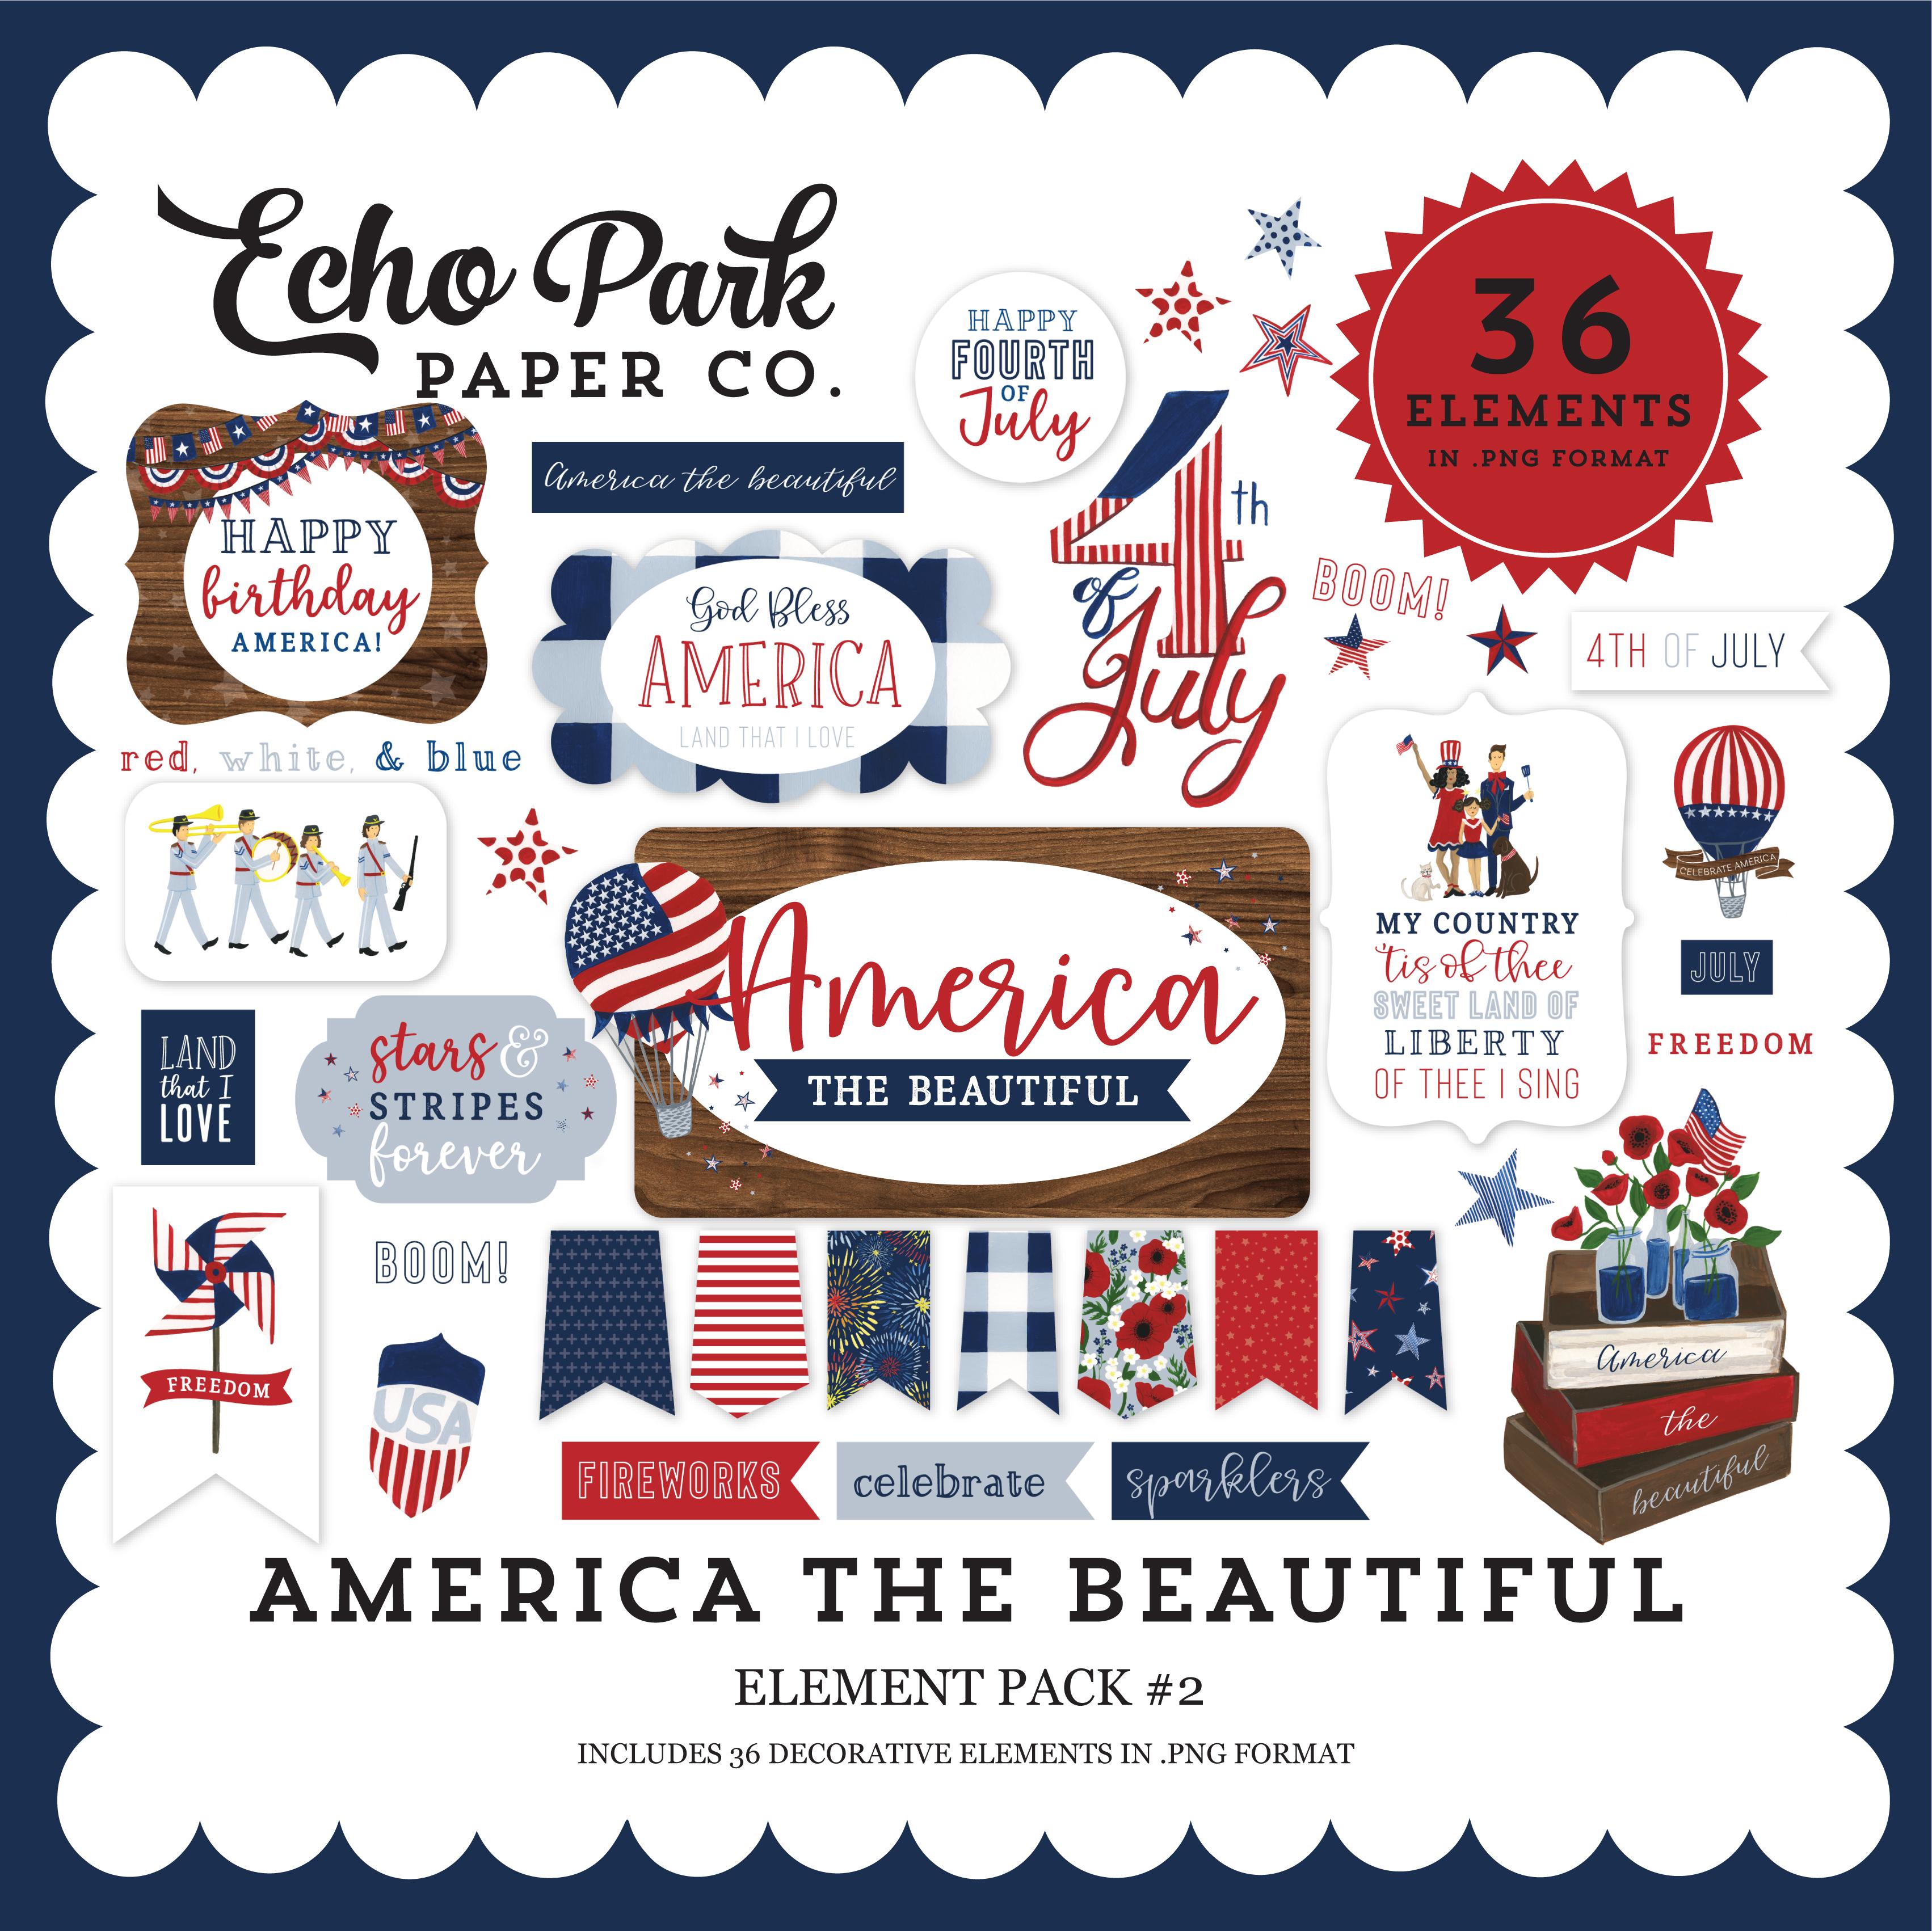 America the Beautiful Element Pack #2